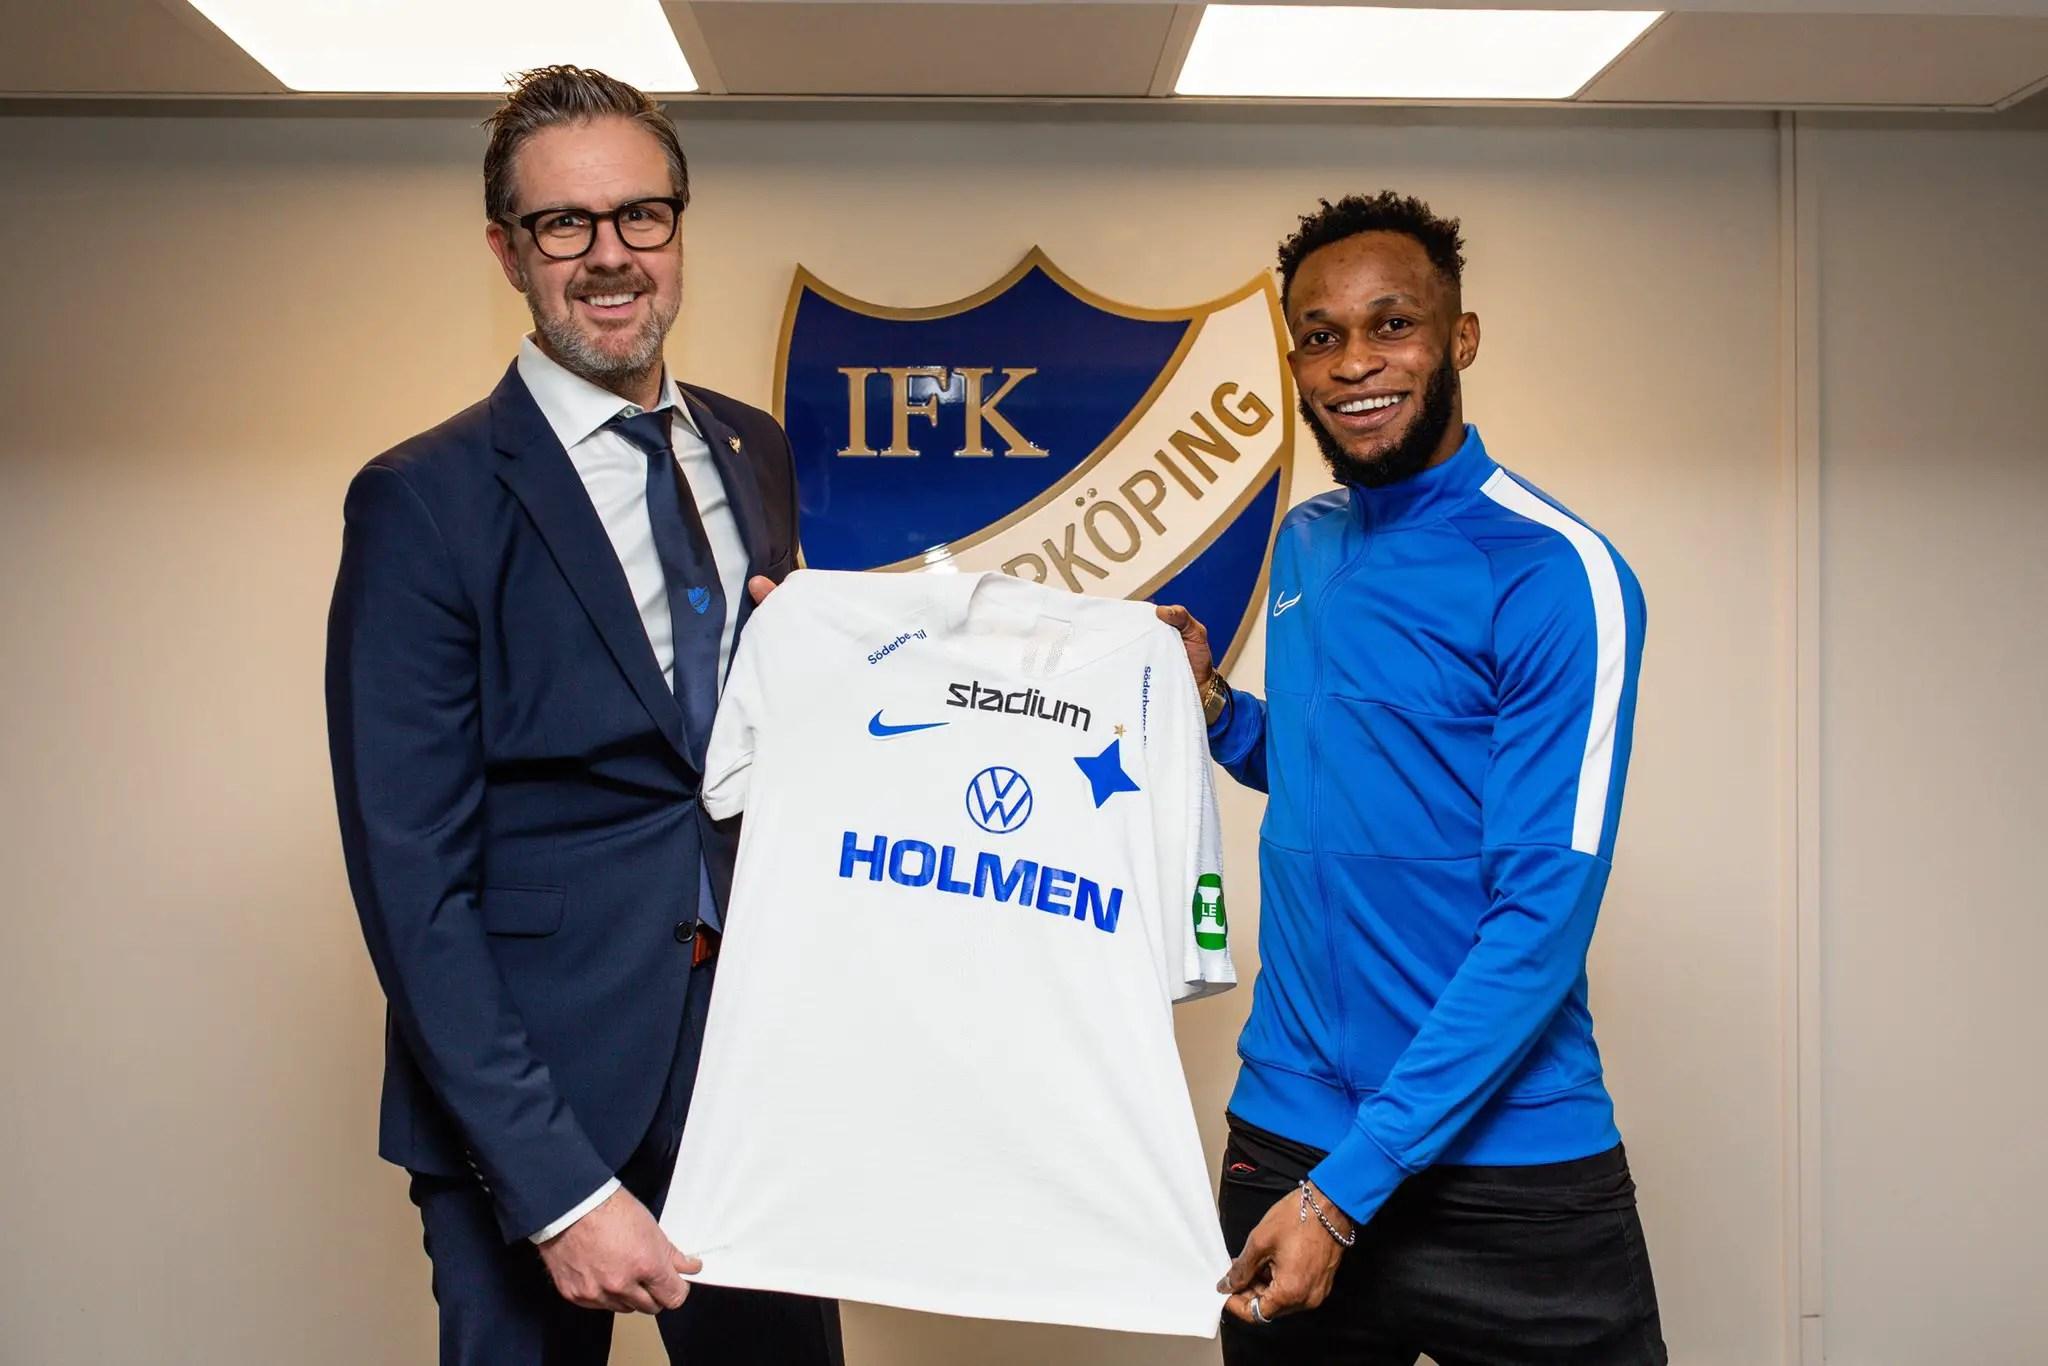 Nigeria Winger Adegbenro Joins Swedish Club IFK Norrköping